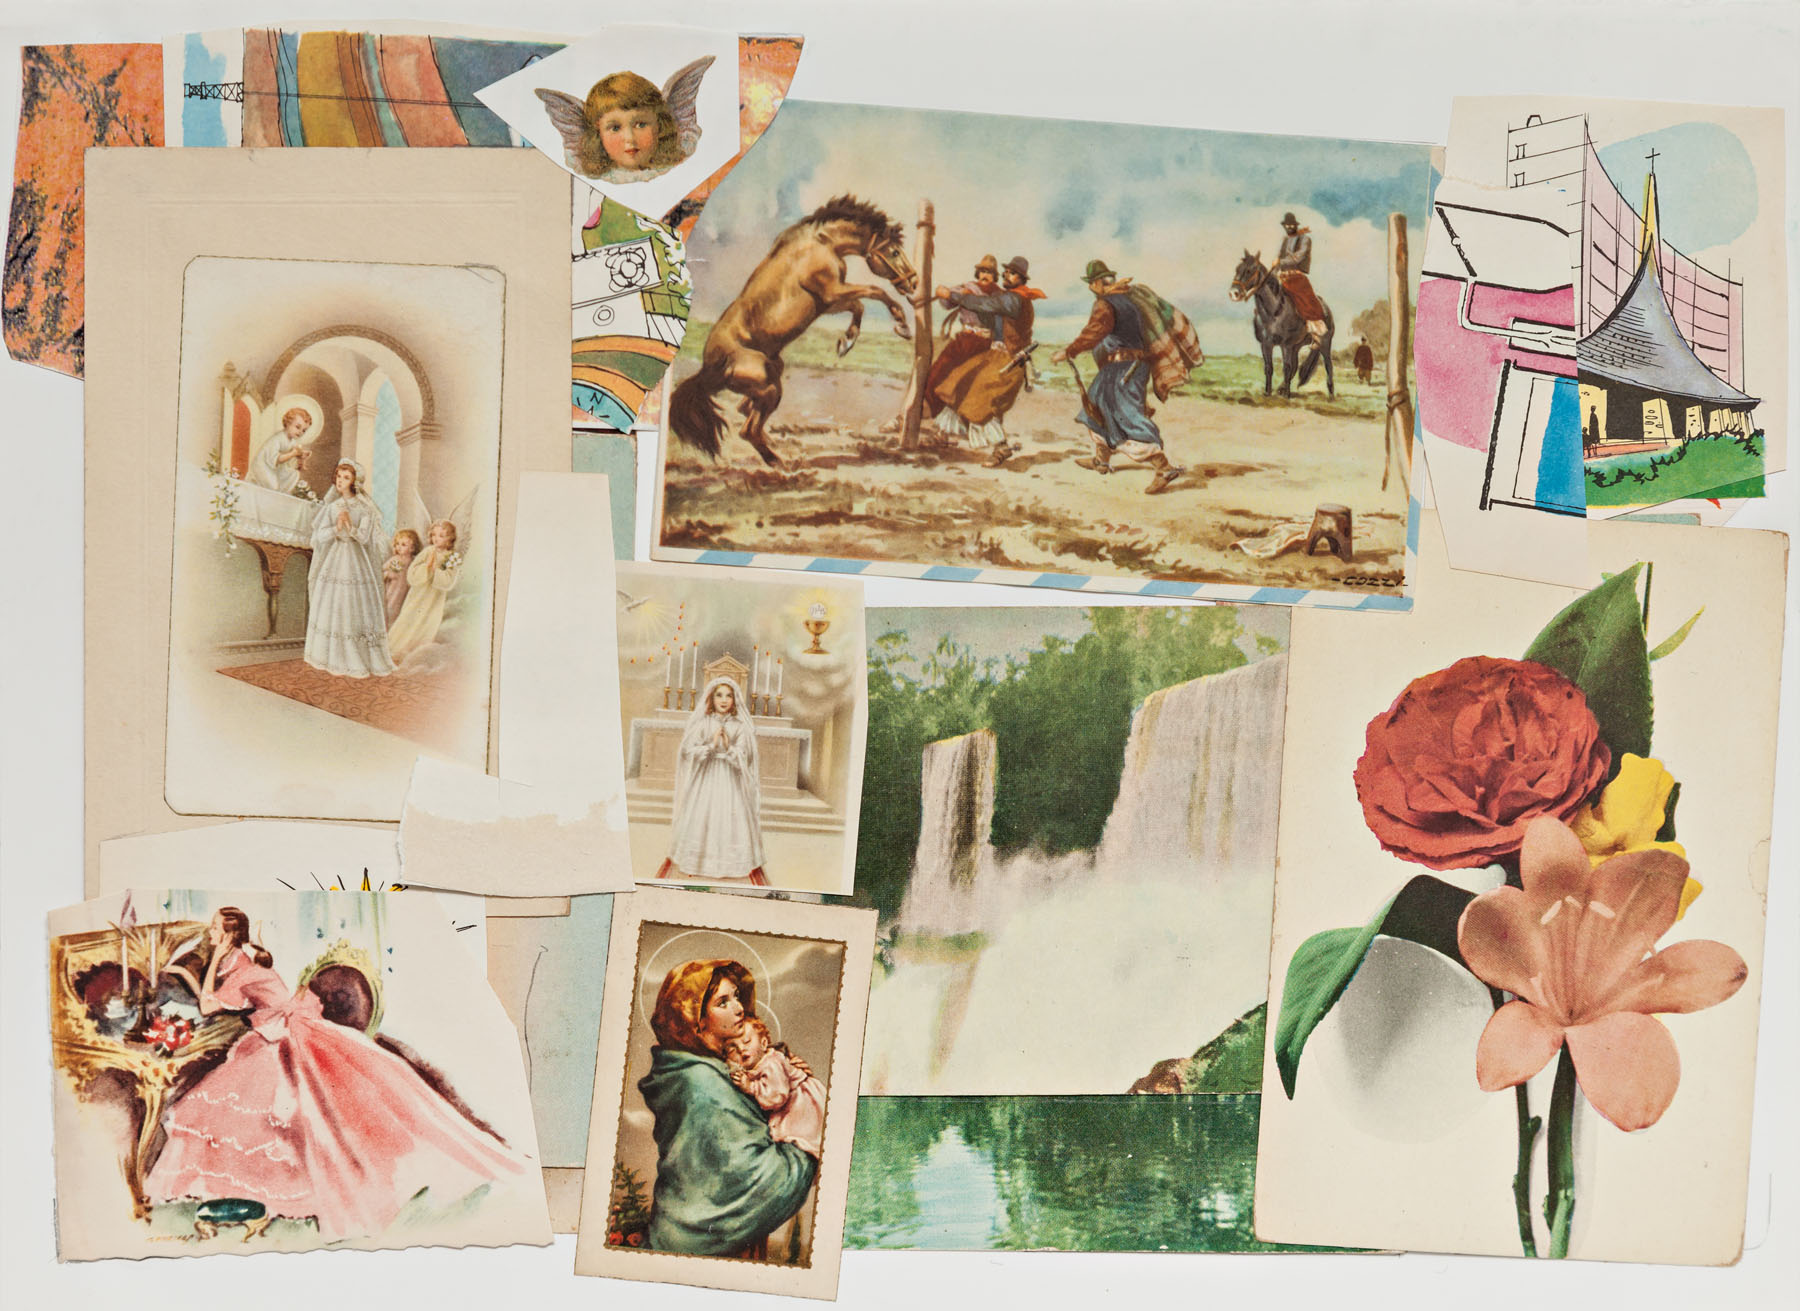 Serie Cuarentena, papel collage, 24 cm x 32, 5 cm, 2020